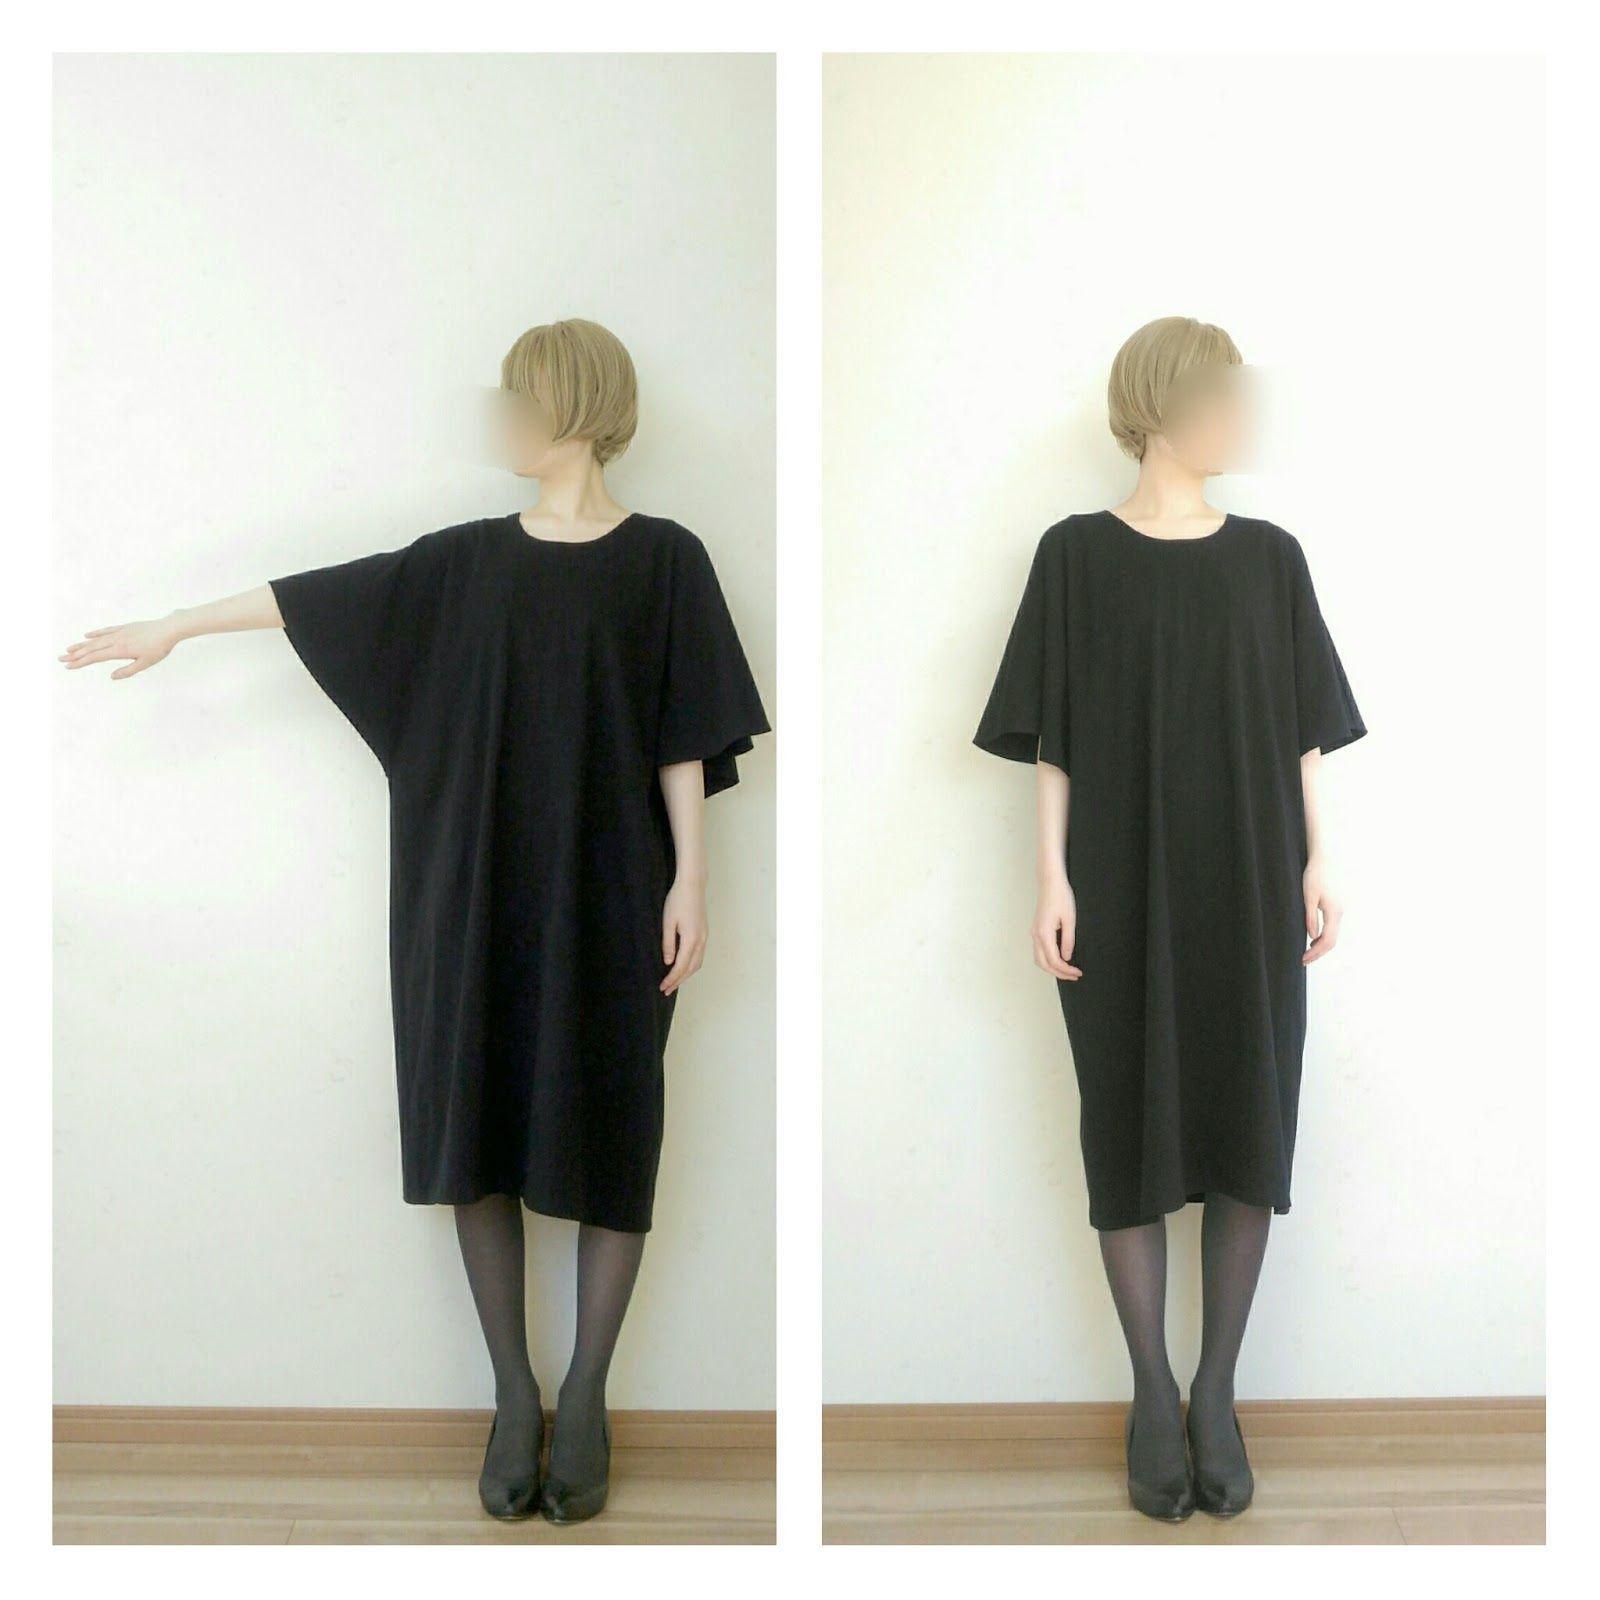 all ブログ内の服の全ての型紙をまとめました aラインのワンピース あきなし 袖付けなし シンプルで簡単なワンピースです 型紙 作り方 着物リメイク直線ワンピース 着物の生地幅をそのまま使う直線ワンピースです 服作り方 ワンピース作り方